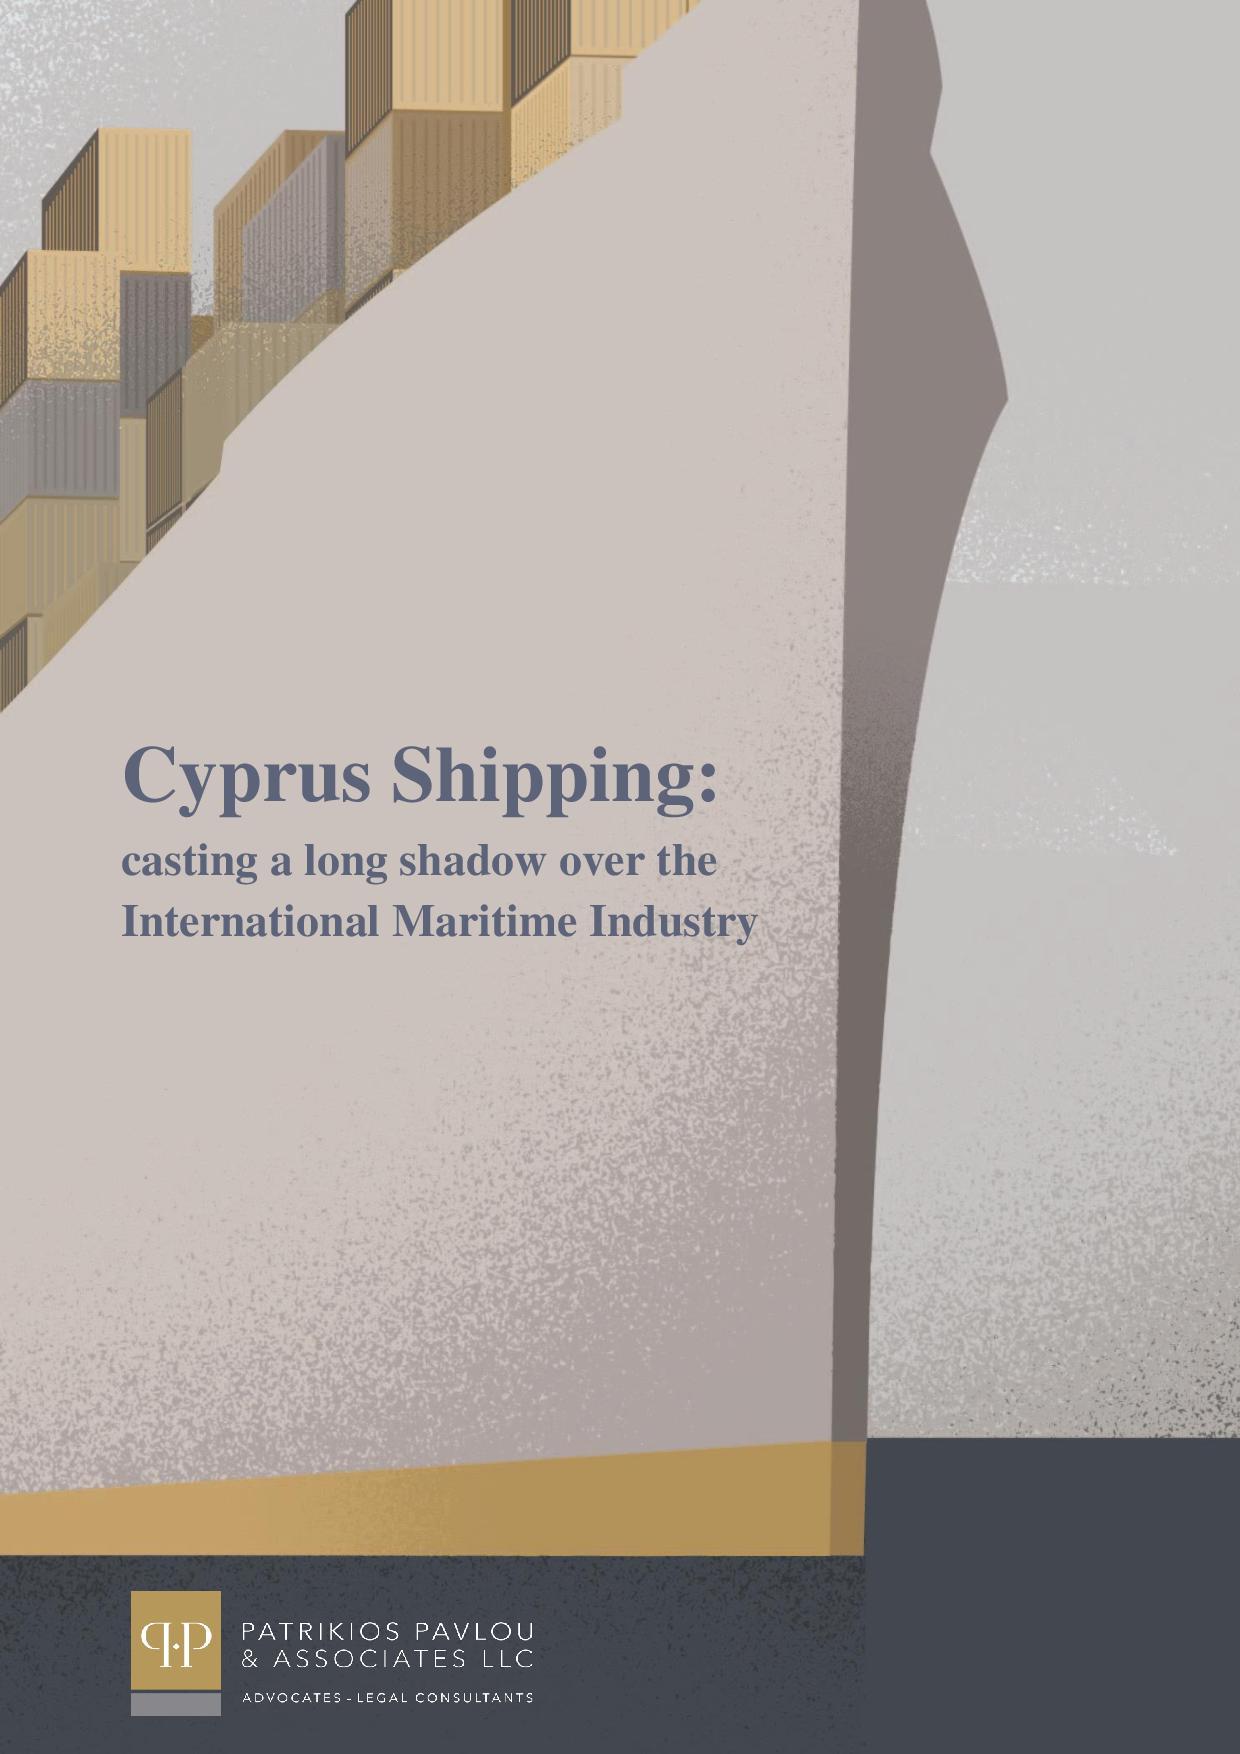 Patrikios Pavlou & Associates LLC: Cyprus Shipping